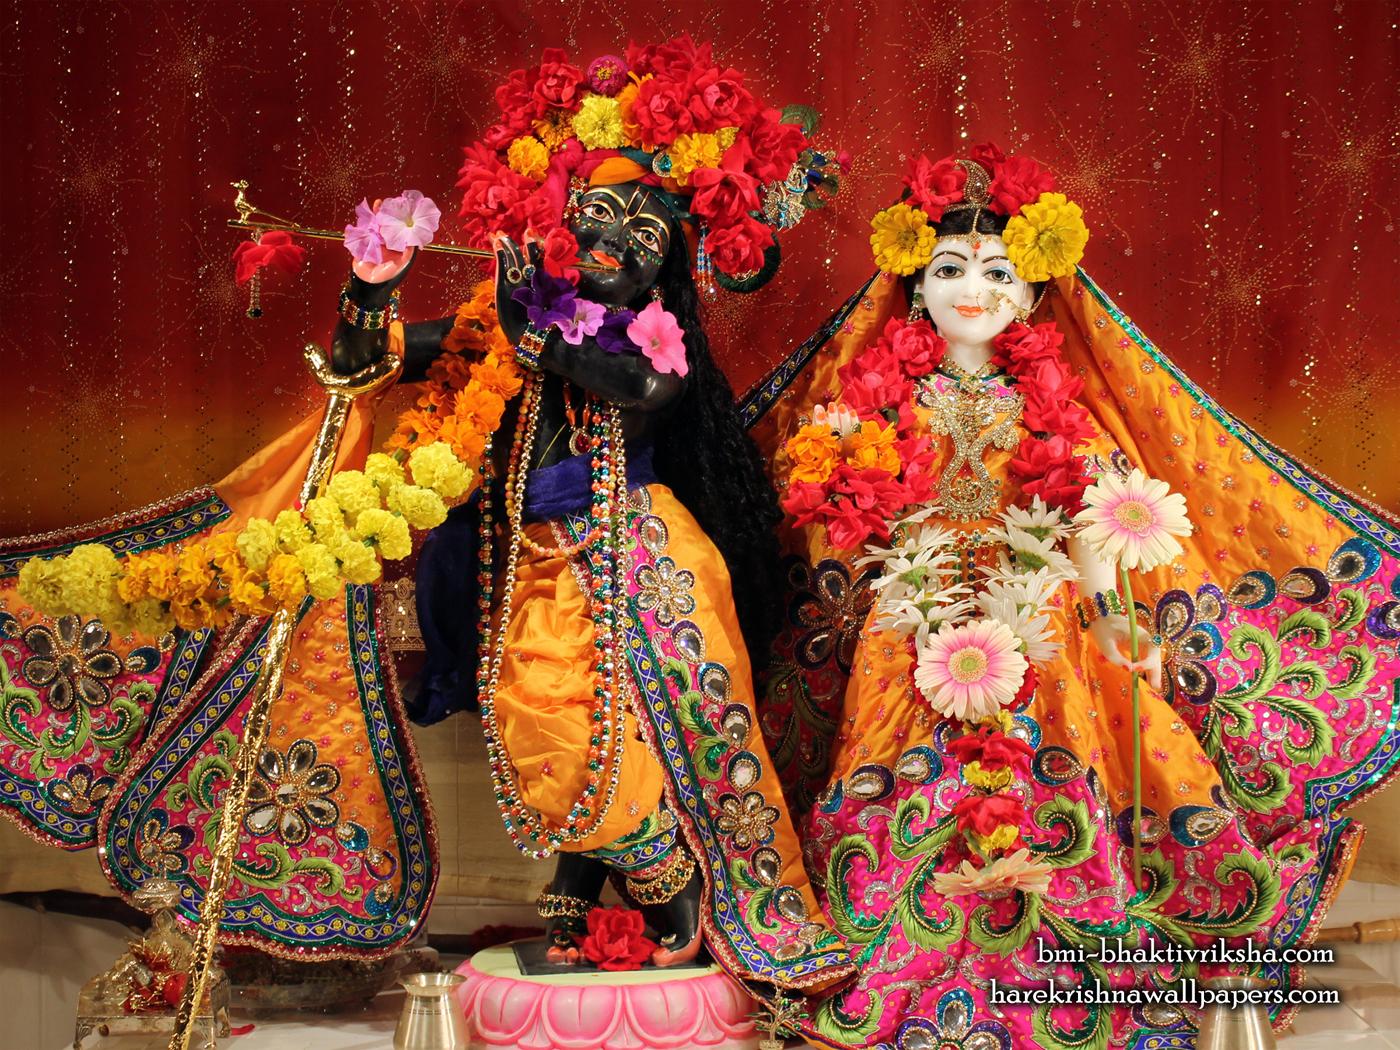 Sri Sri Radha Shyamsundar Wallpaper (001) Size 1400x1050 Download